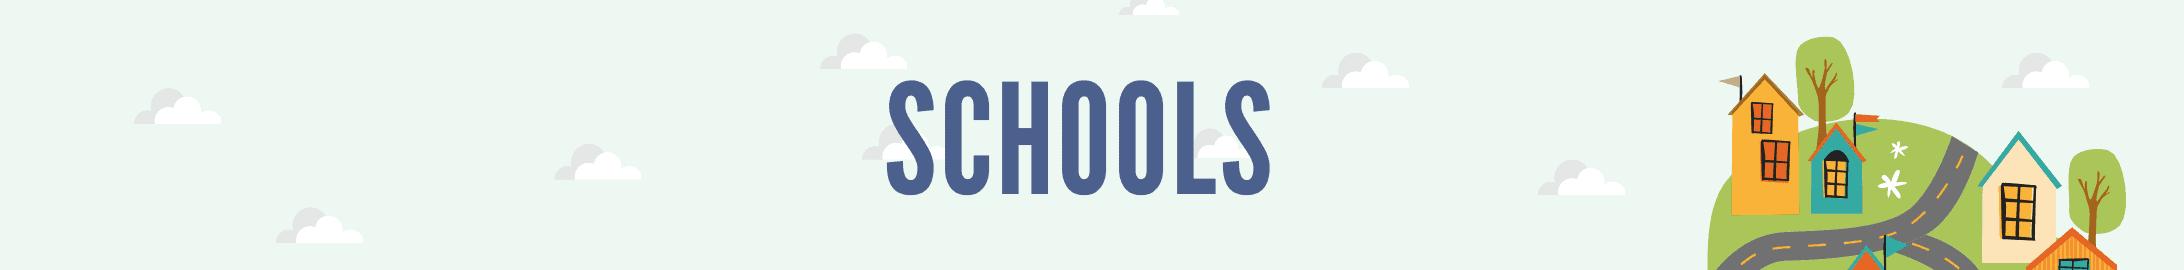 Moving to gulf coast schools